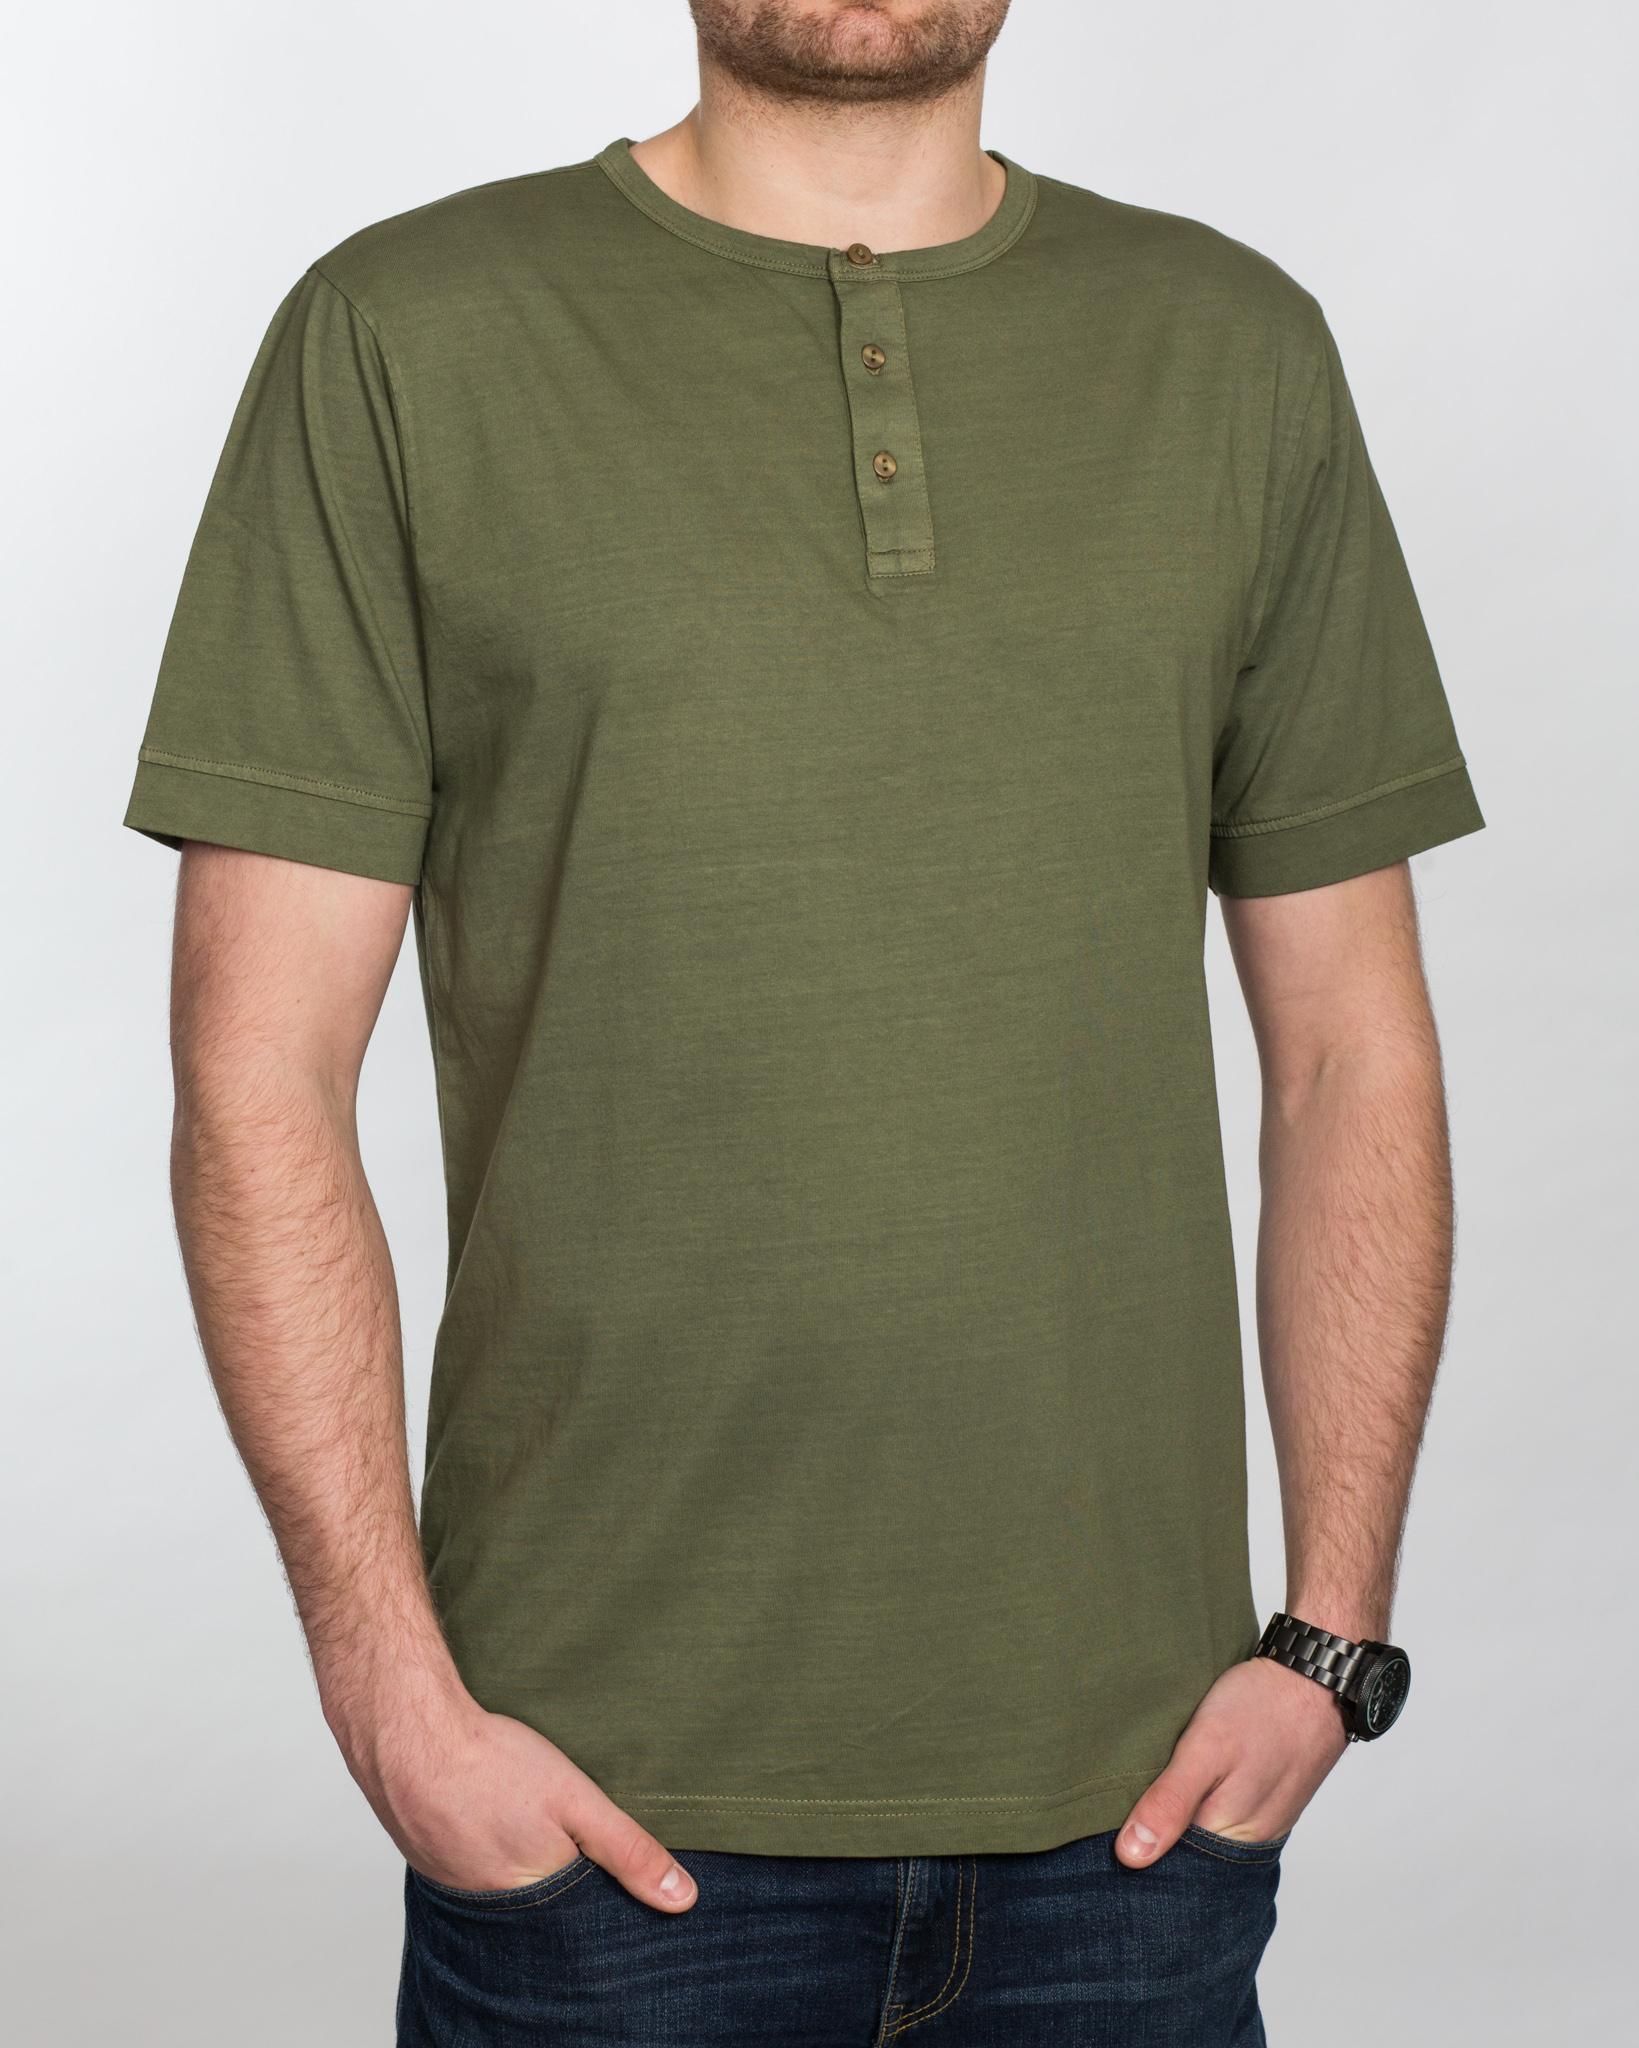 Replica Grandad Shirt (olive)